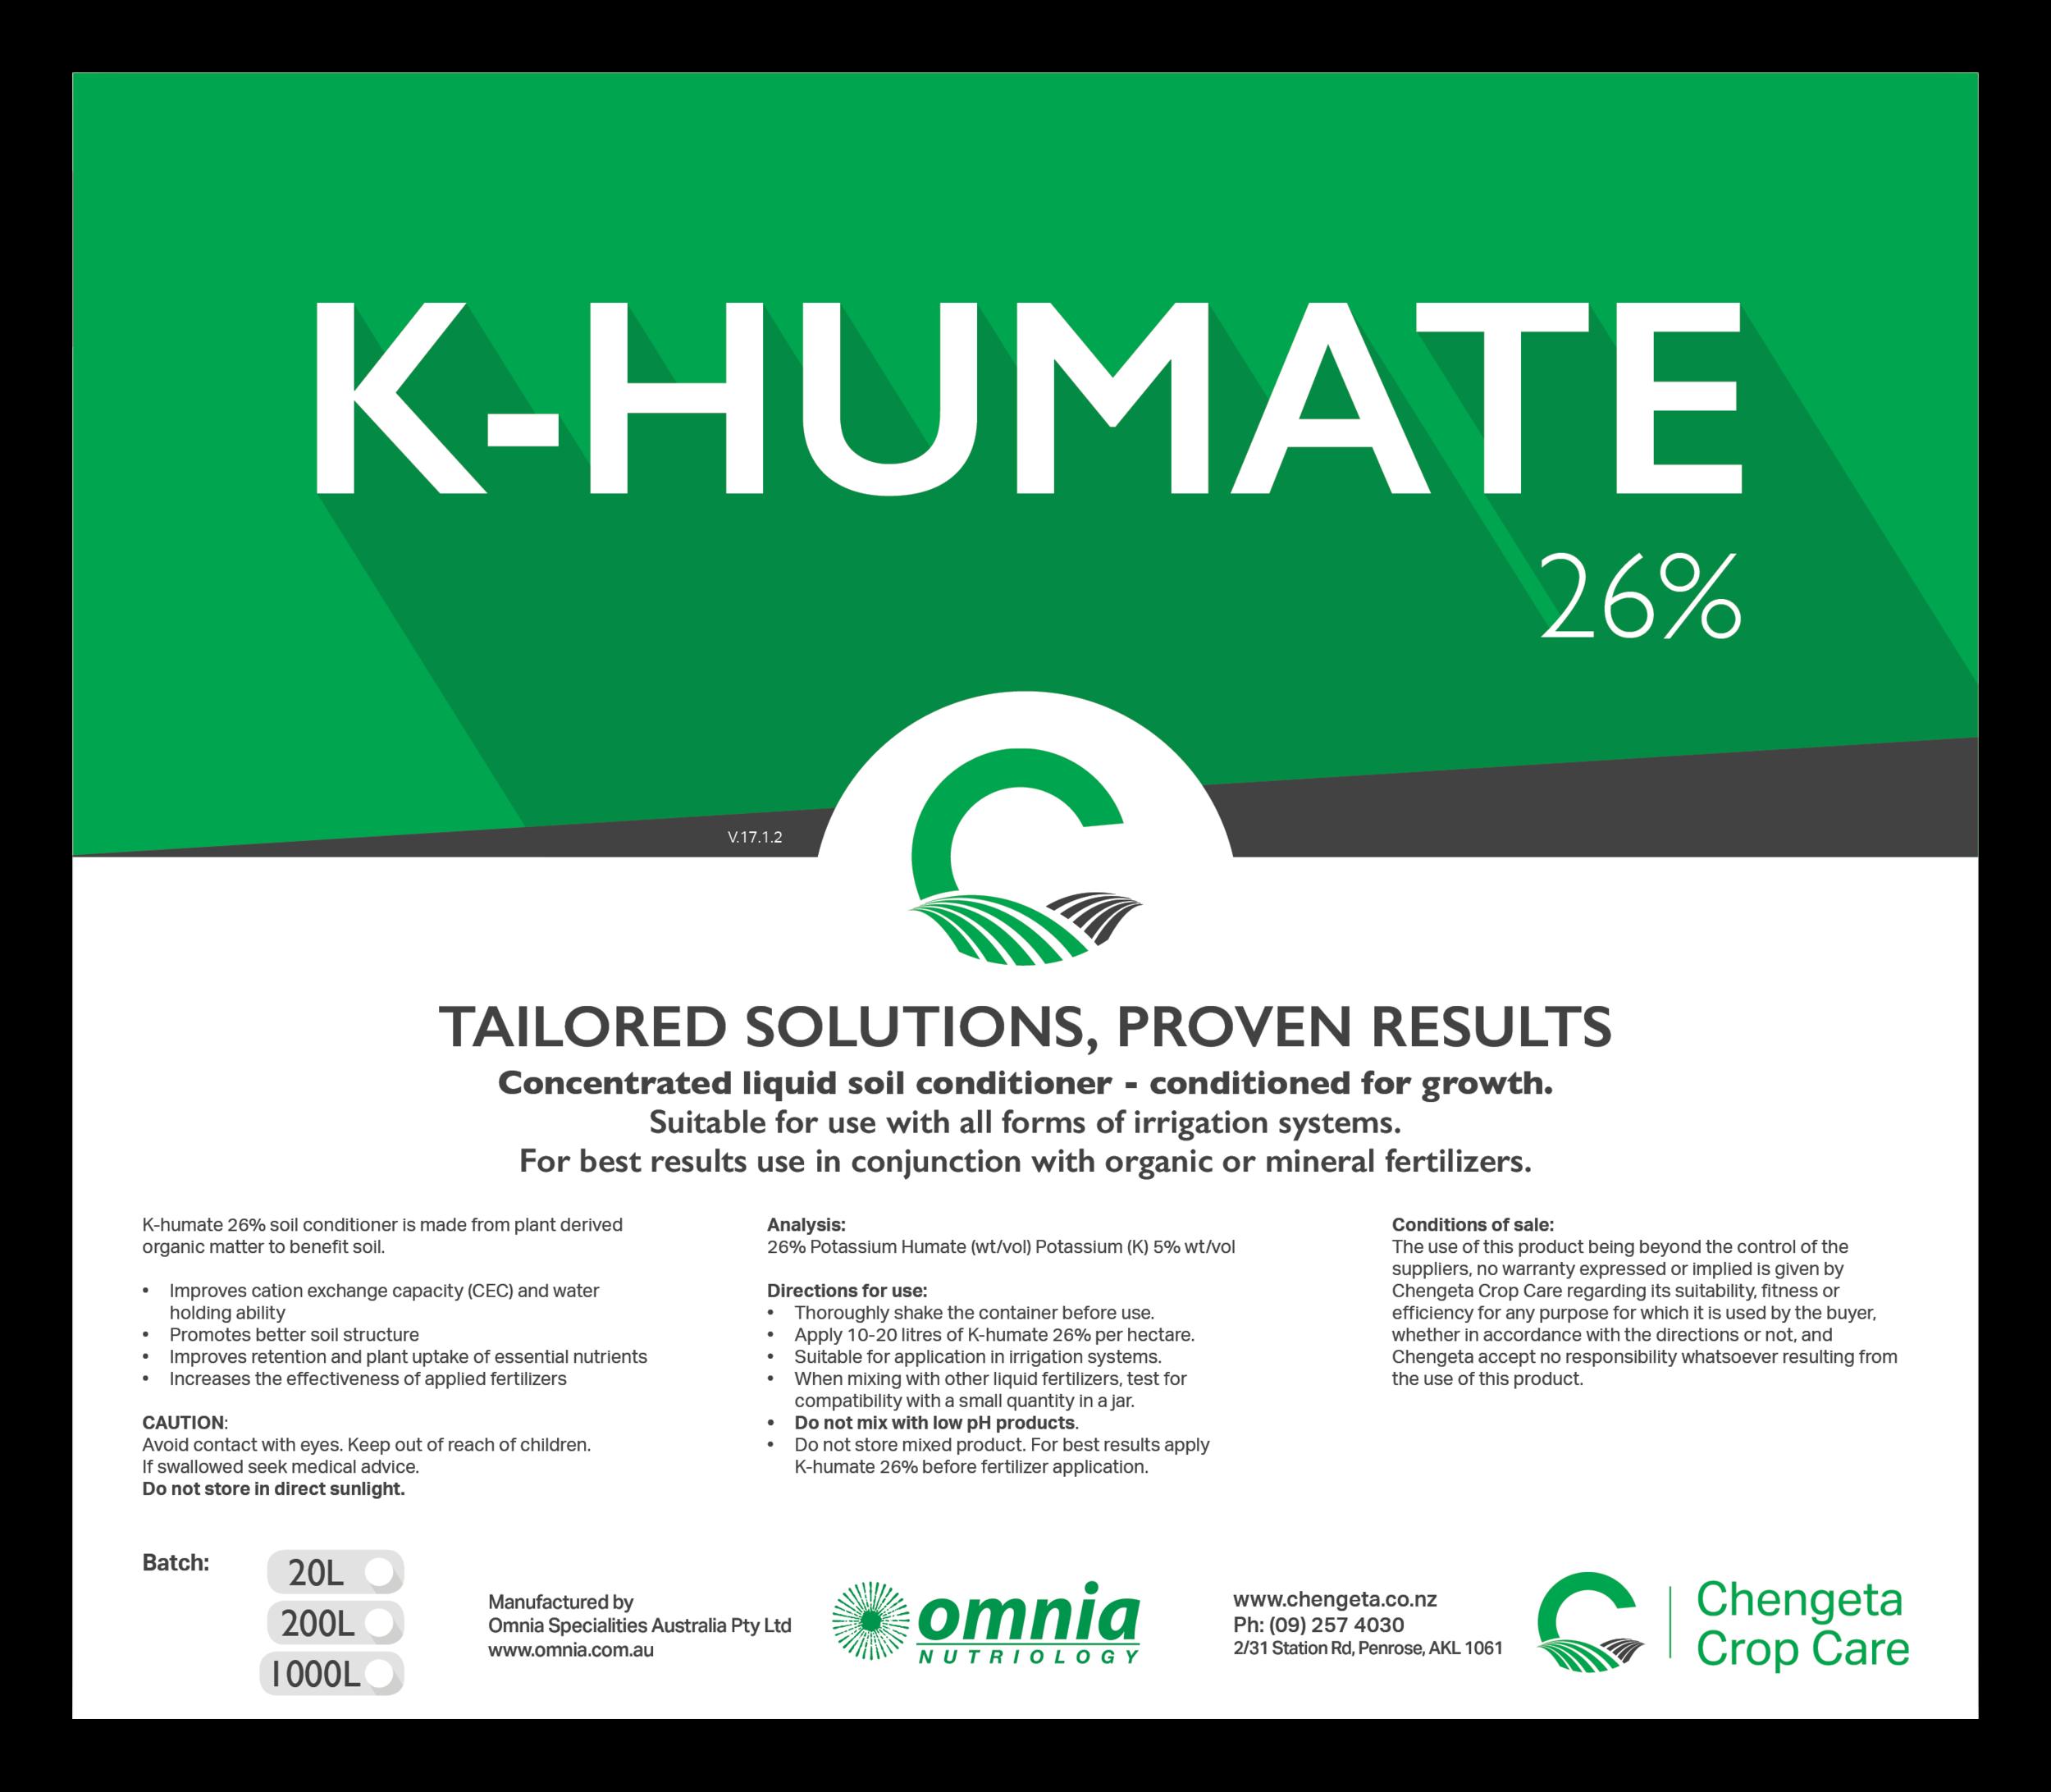 K-Humate (v.17.1.2) [20,200,1000].png